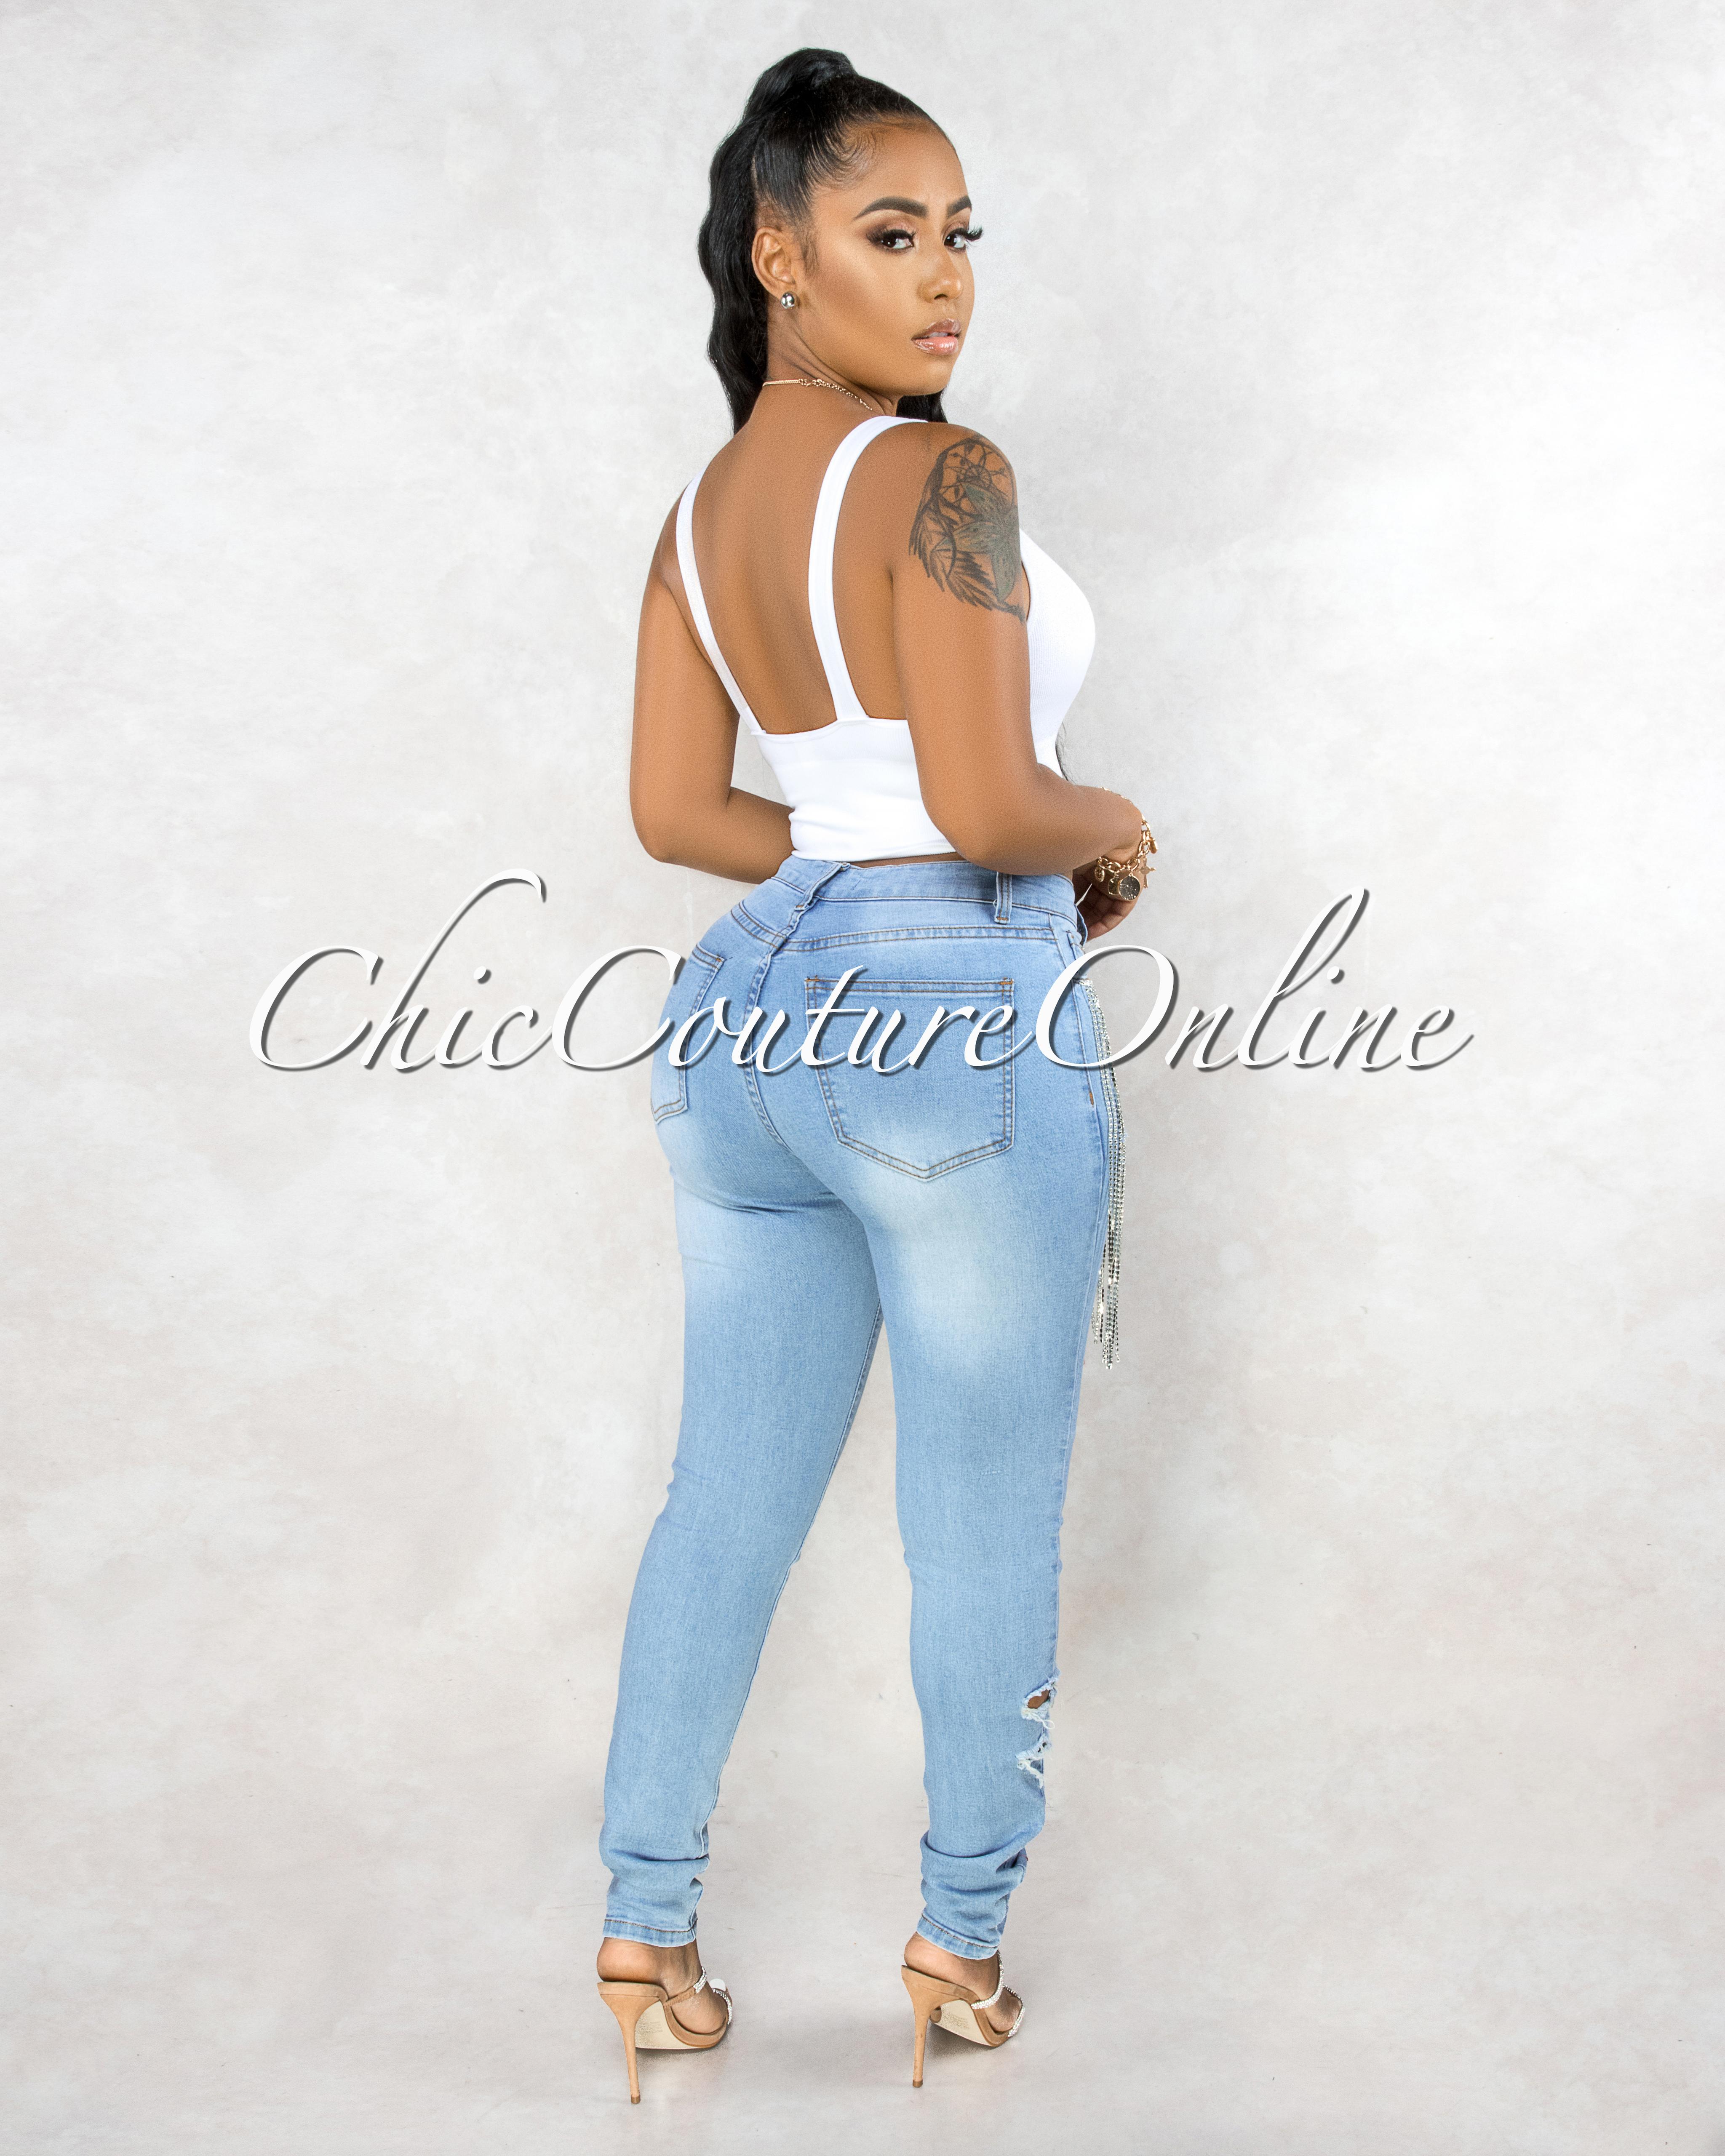 Katana Light Blue Denim Distressed Rhinestones Fringe Jeans